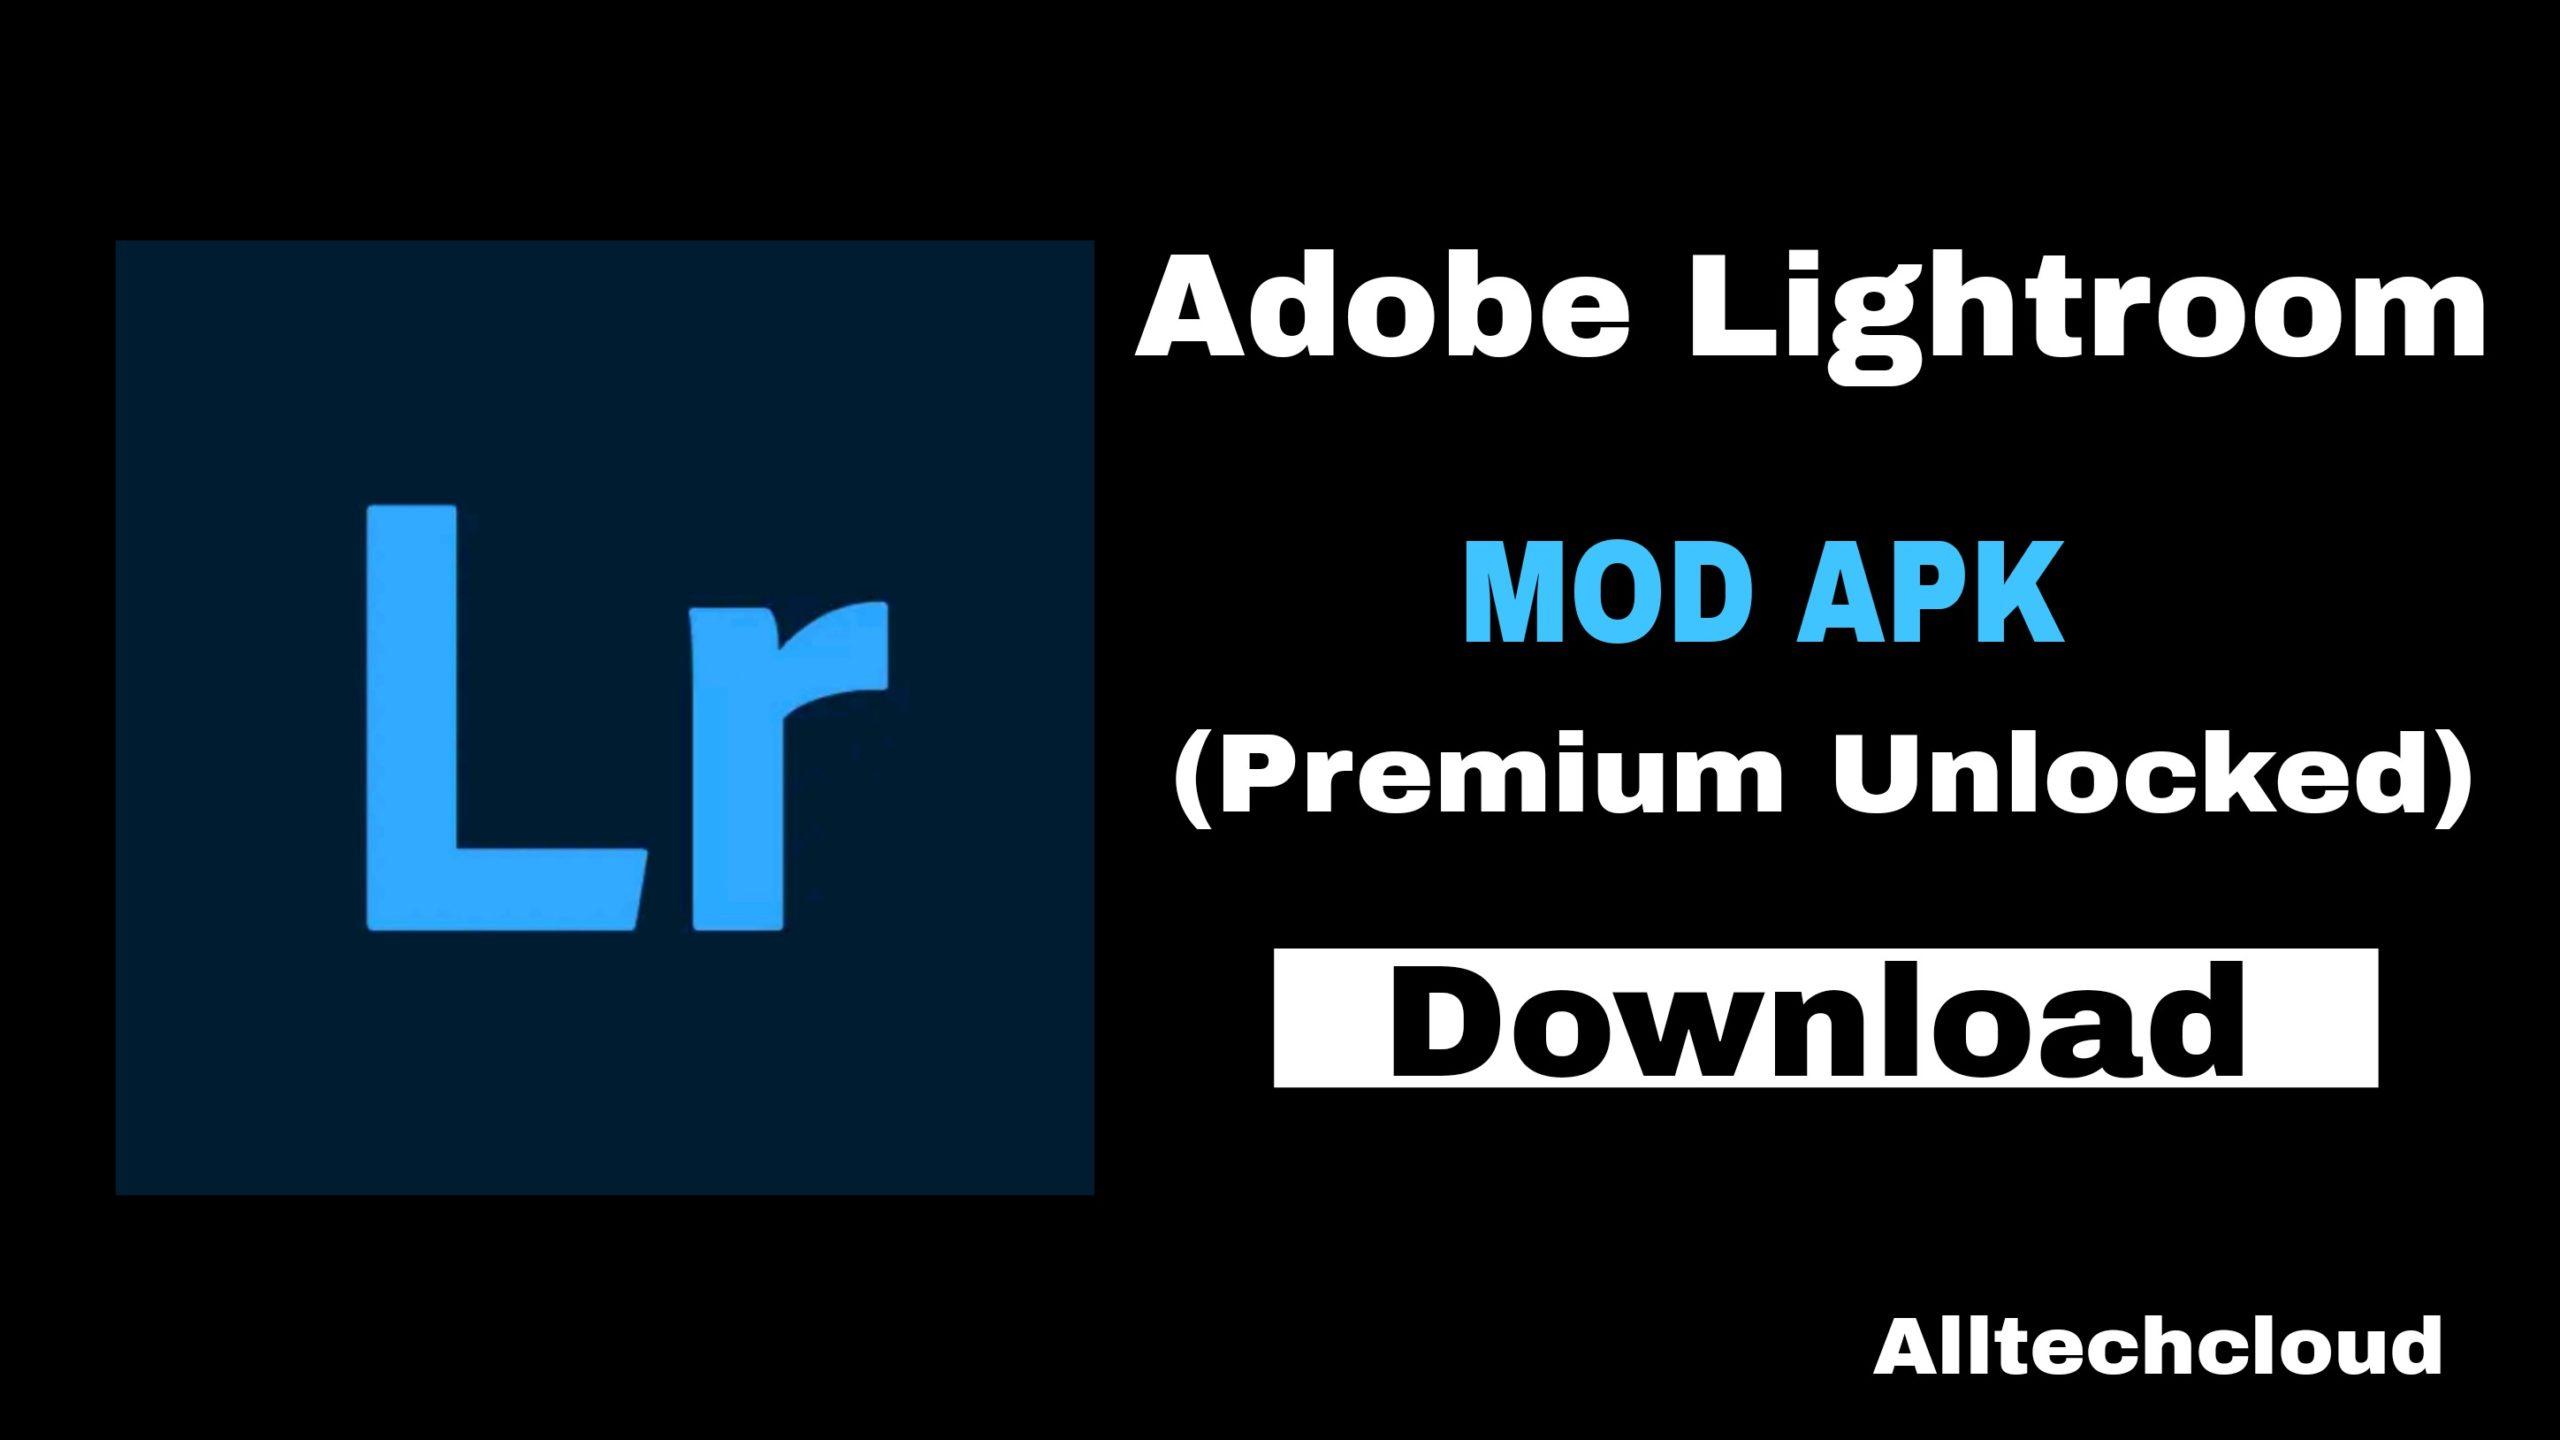 Adobe Lightroom MOD APK v6.3.0 (Premium Unlocked) Free Download